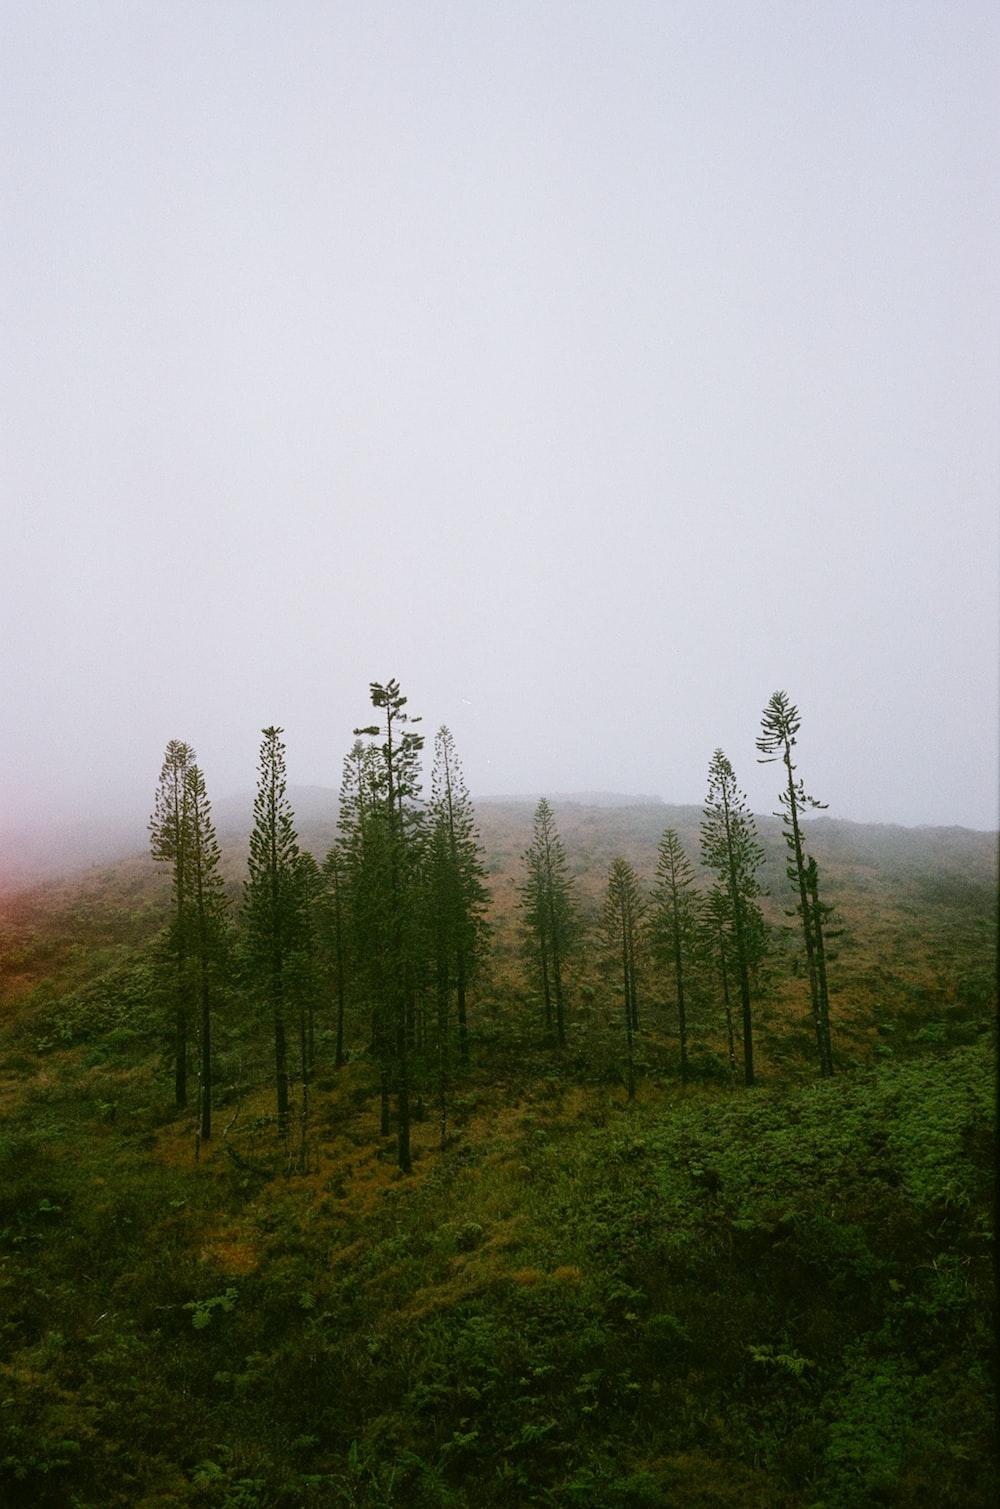 green grass field with fog